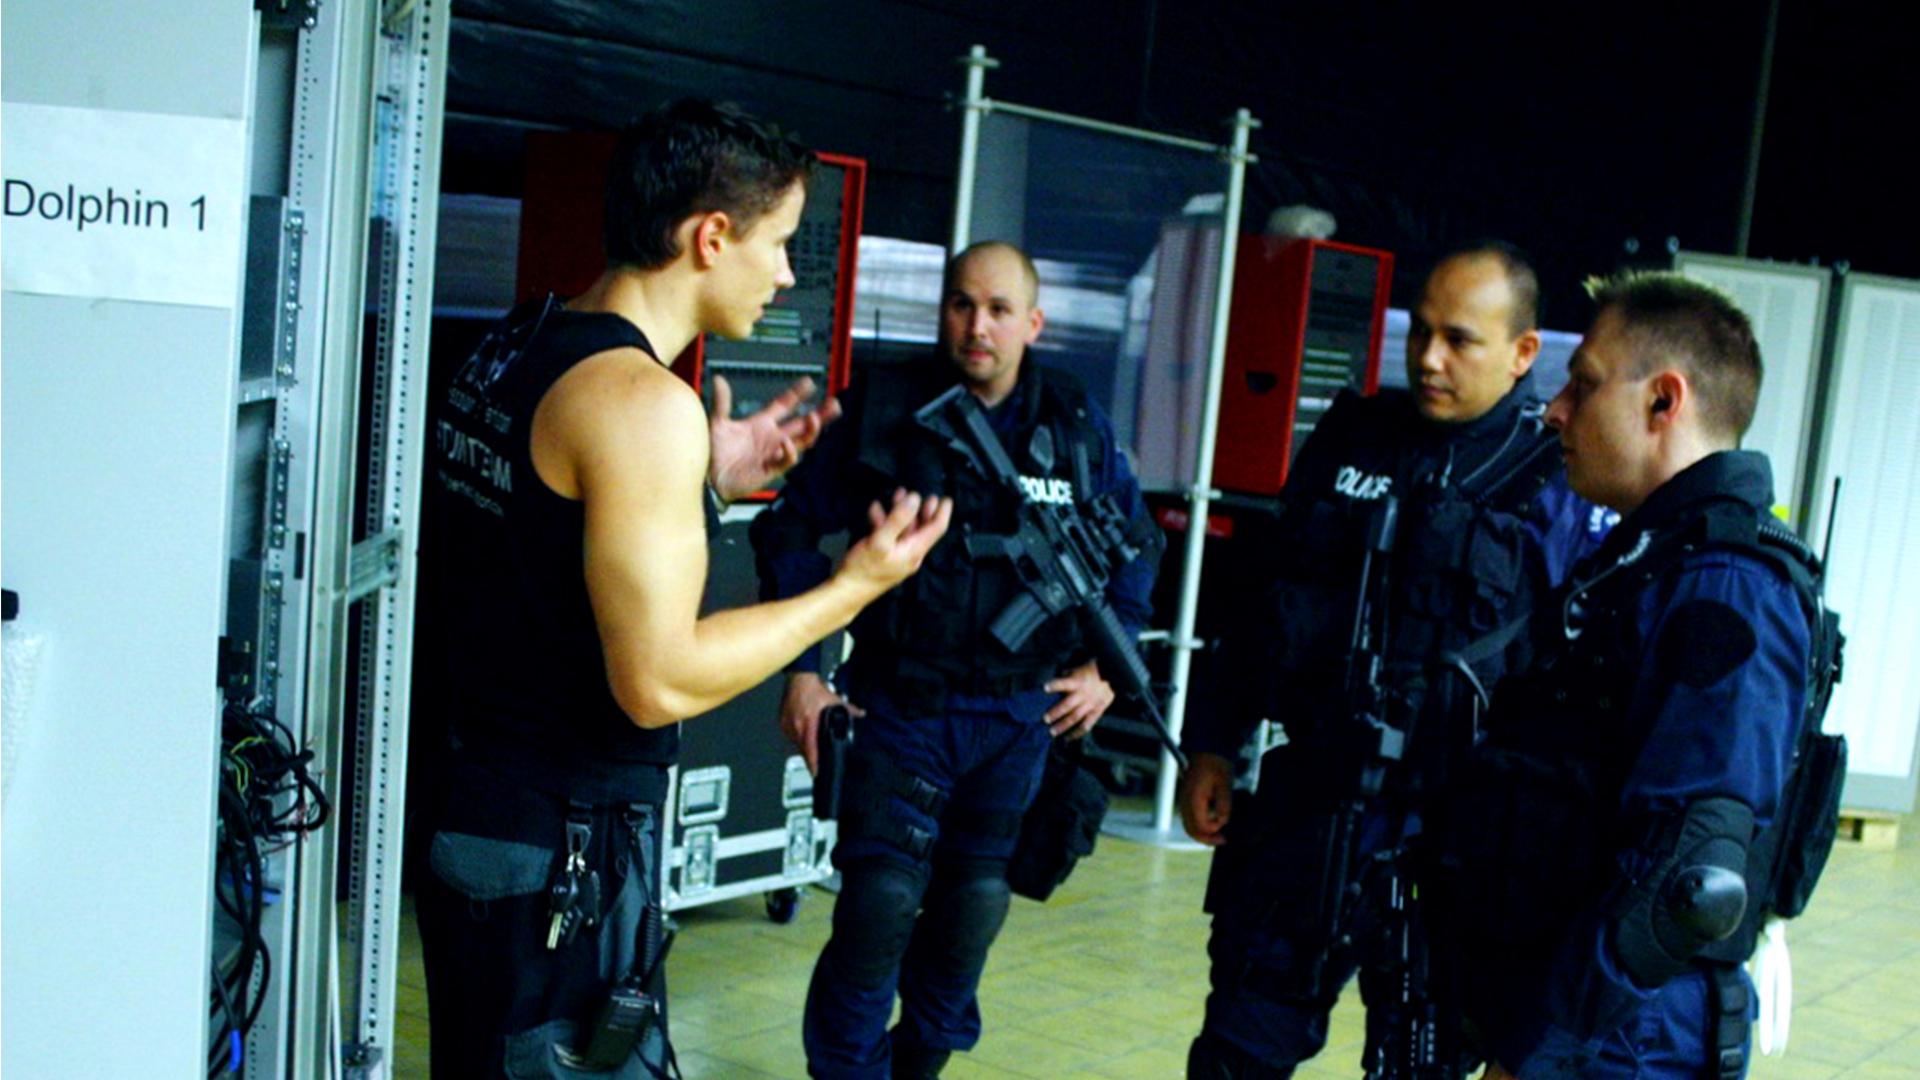 martin goeres, mg action, action training für Schauspieler, actor training, weapon training